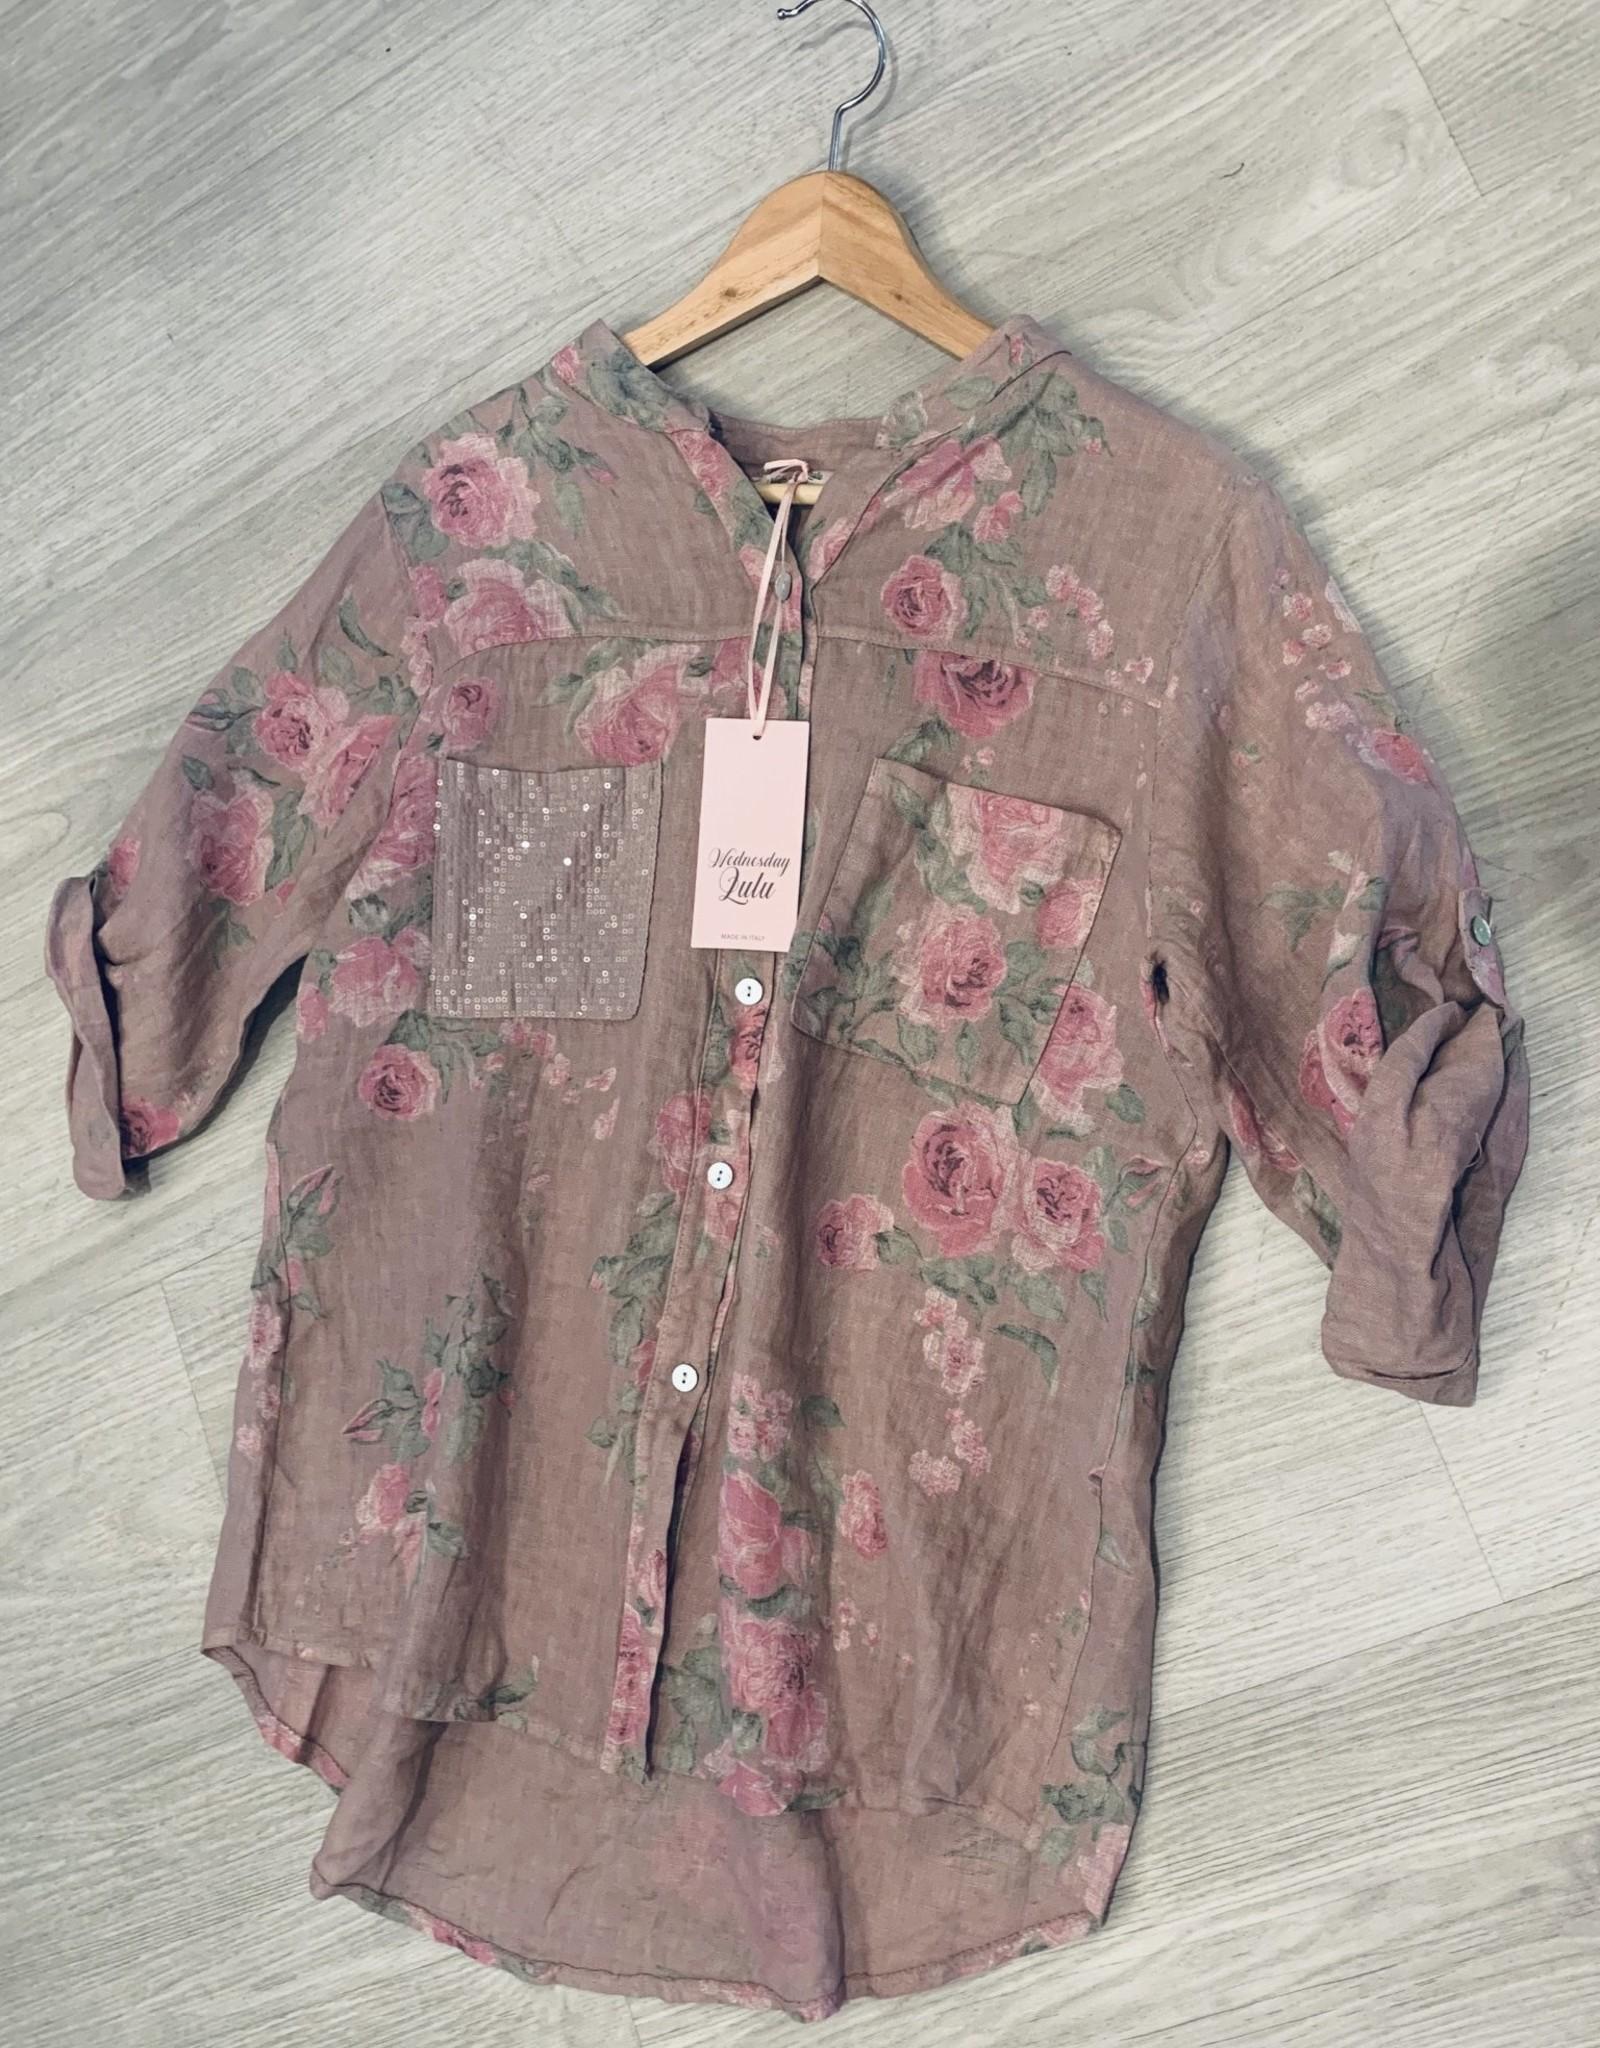 Wednesday Lulu Wednesday Lulu Blush Linen Floral Top S-M